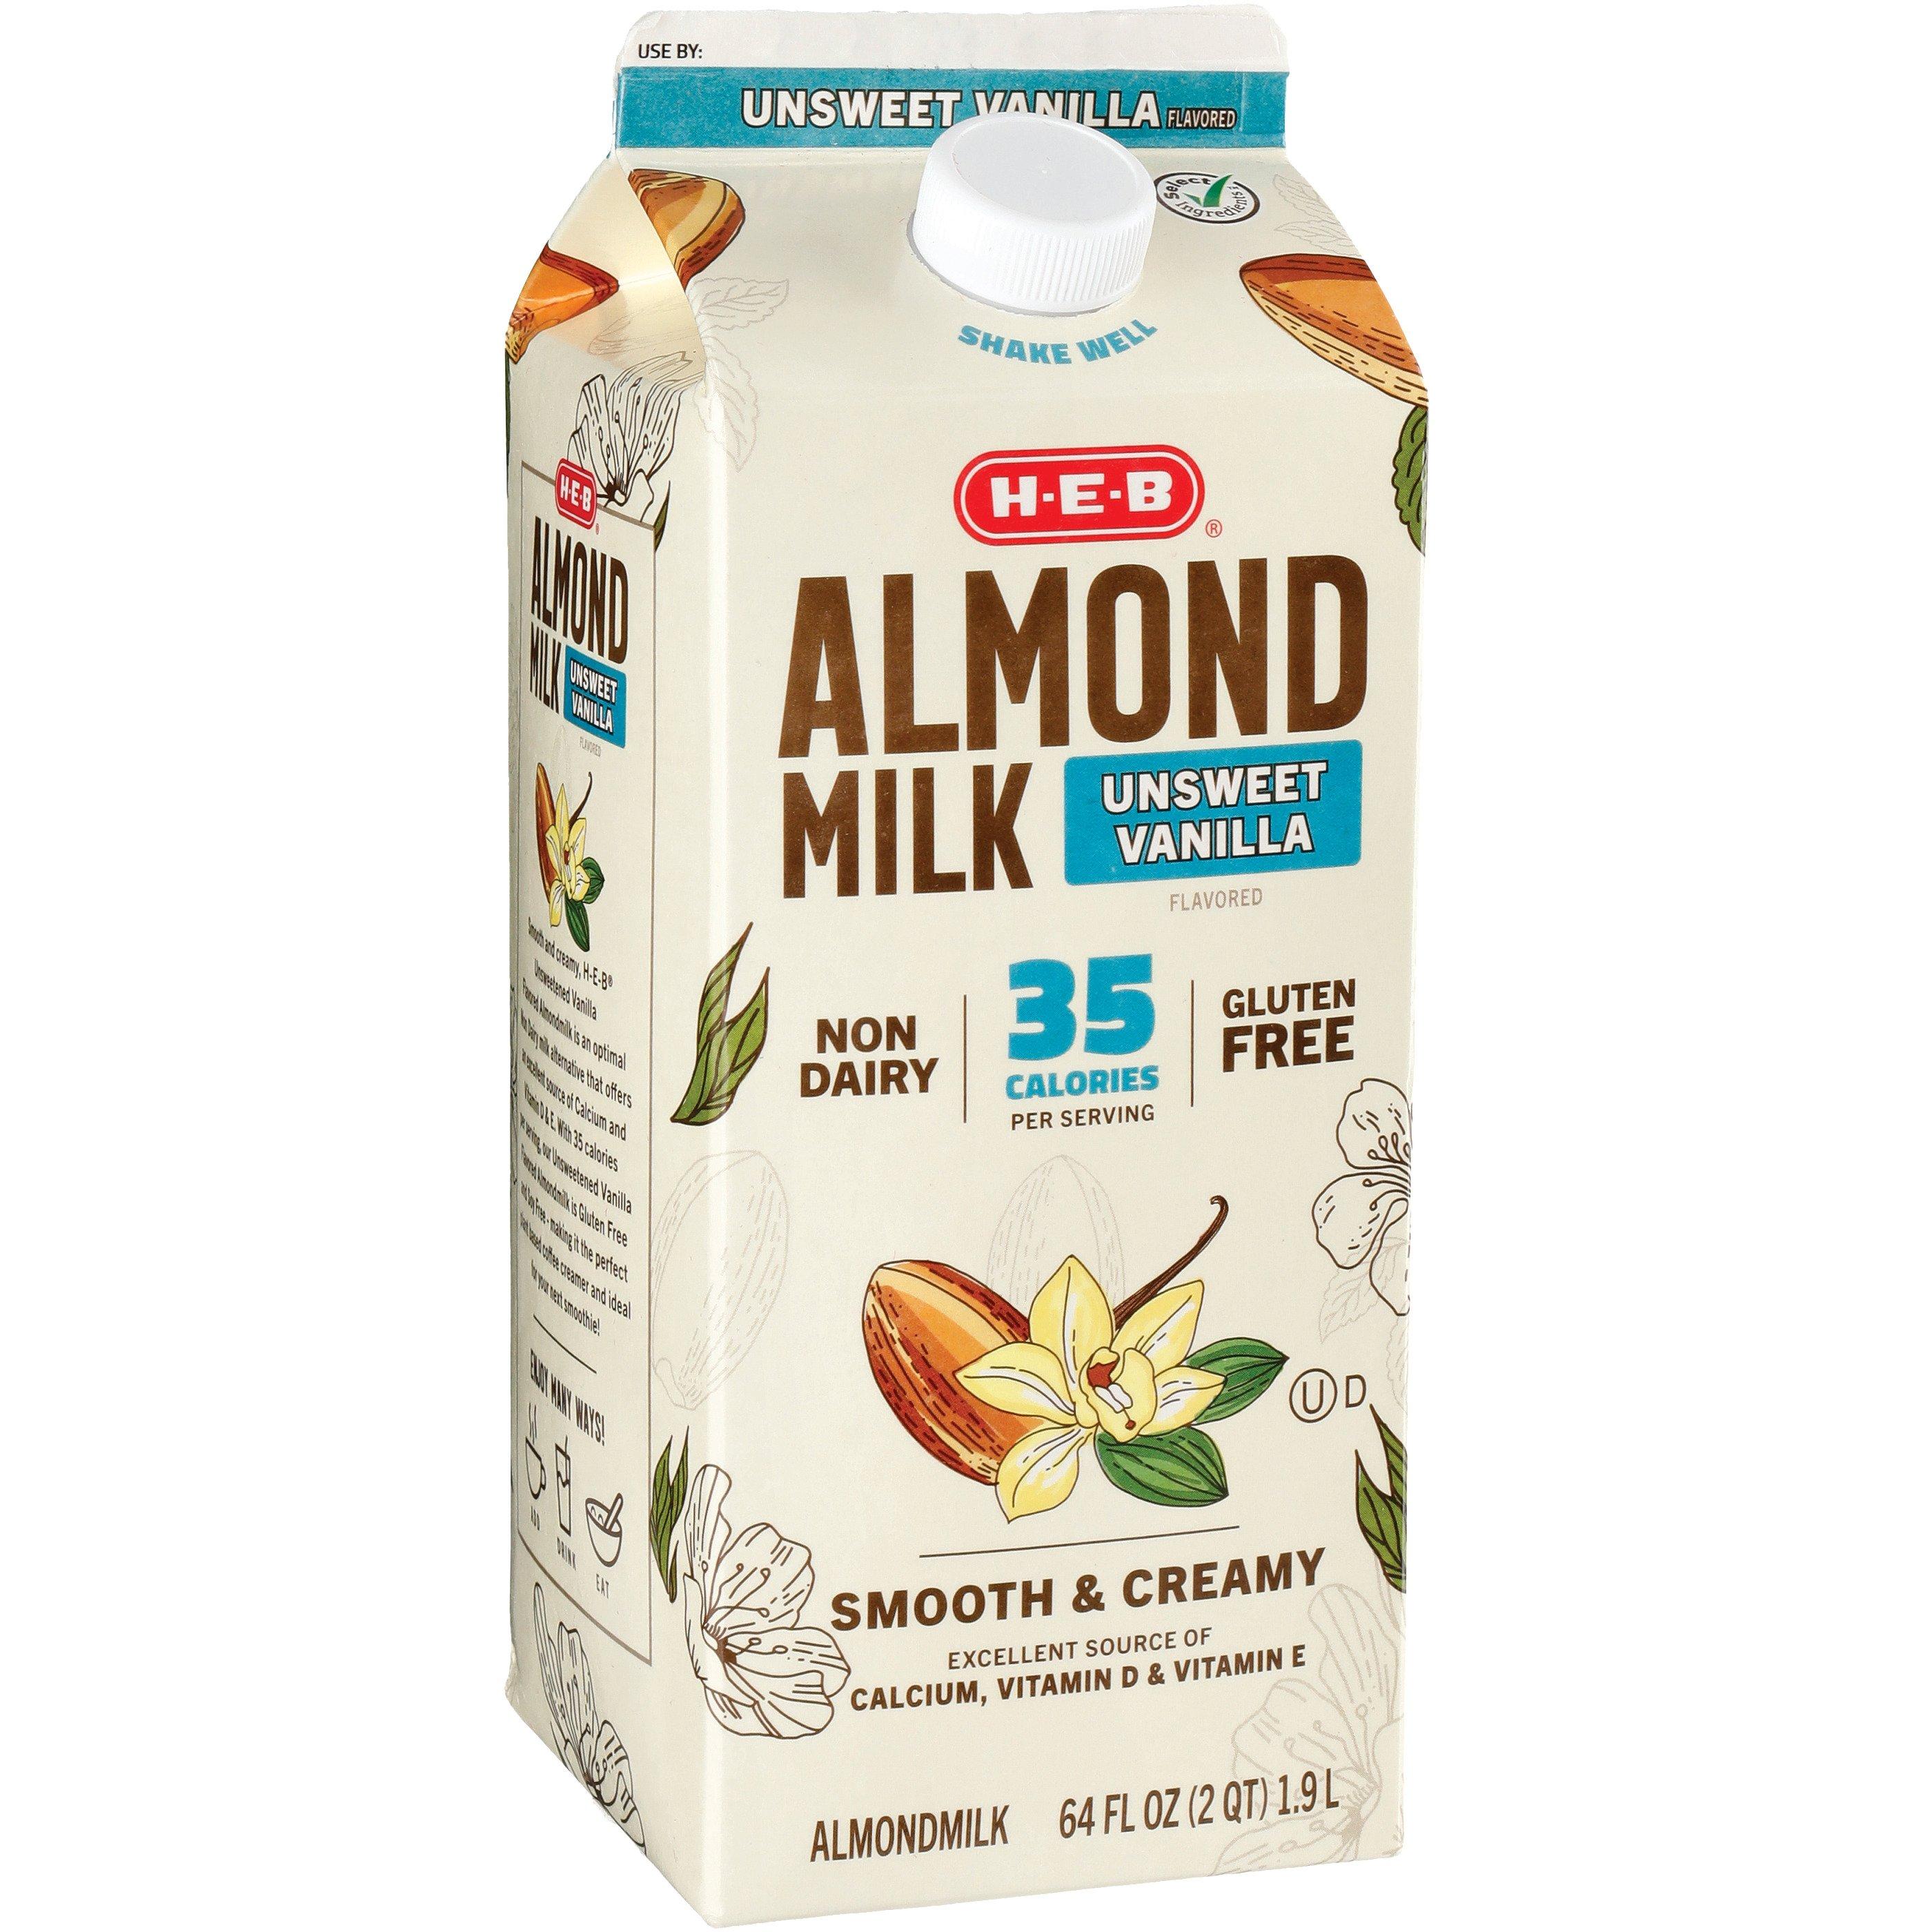 H-E-B Unsweetened Vanilla Almond Milk